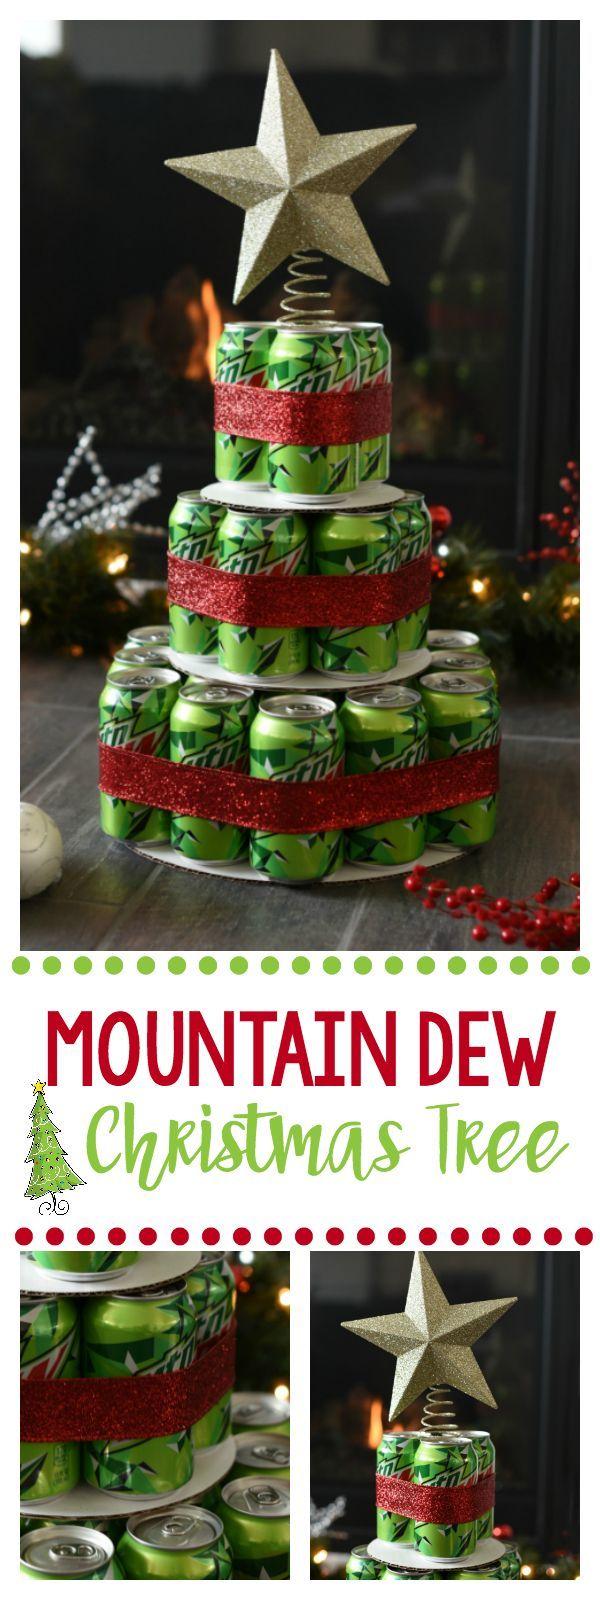 Mountain Dew Gift for Christmas | Pinterest